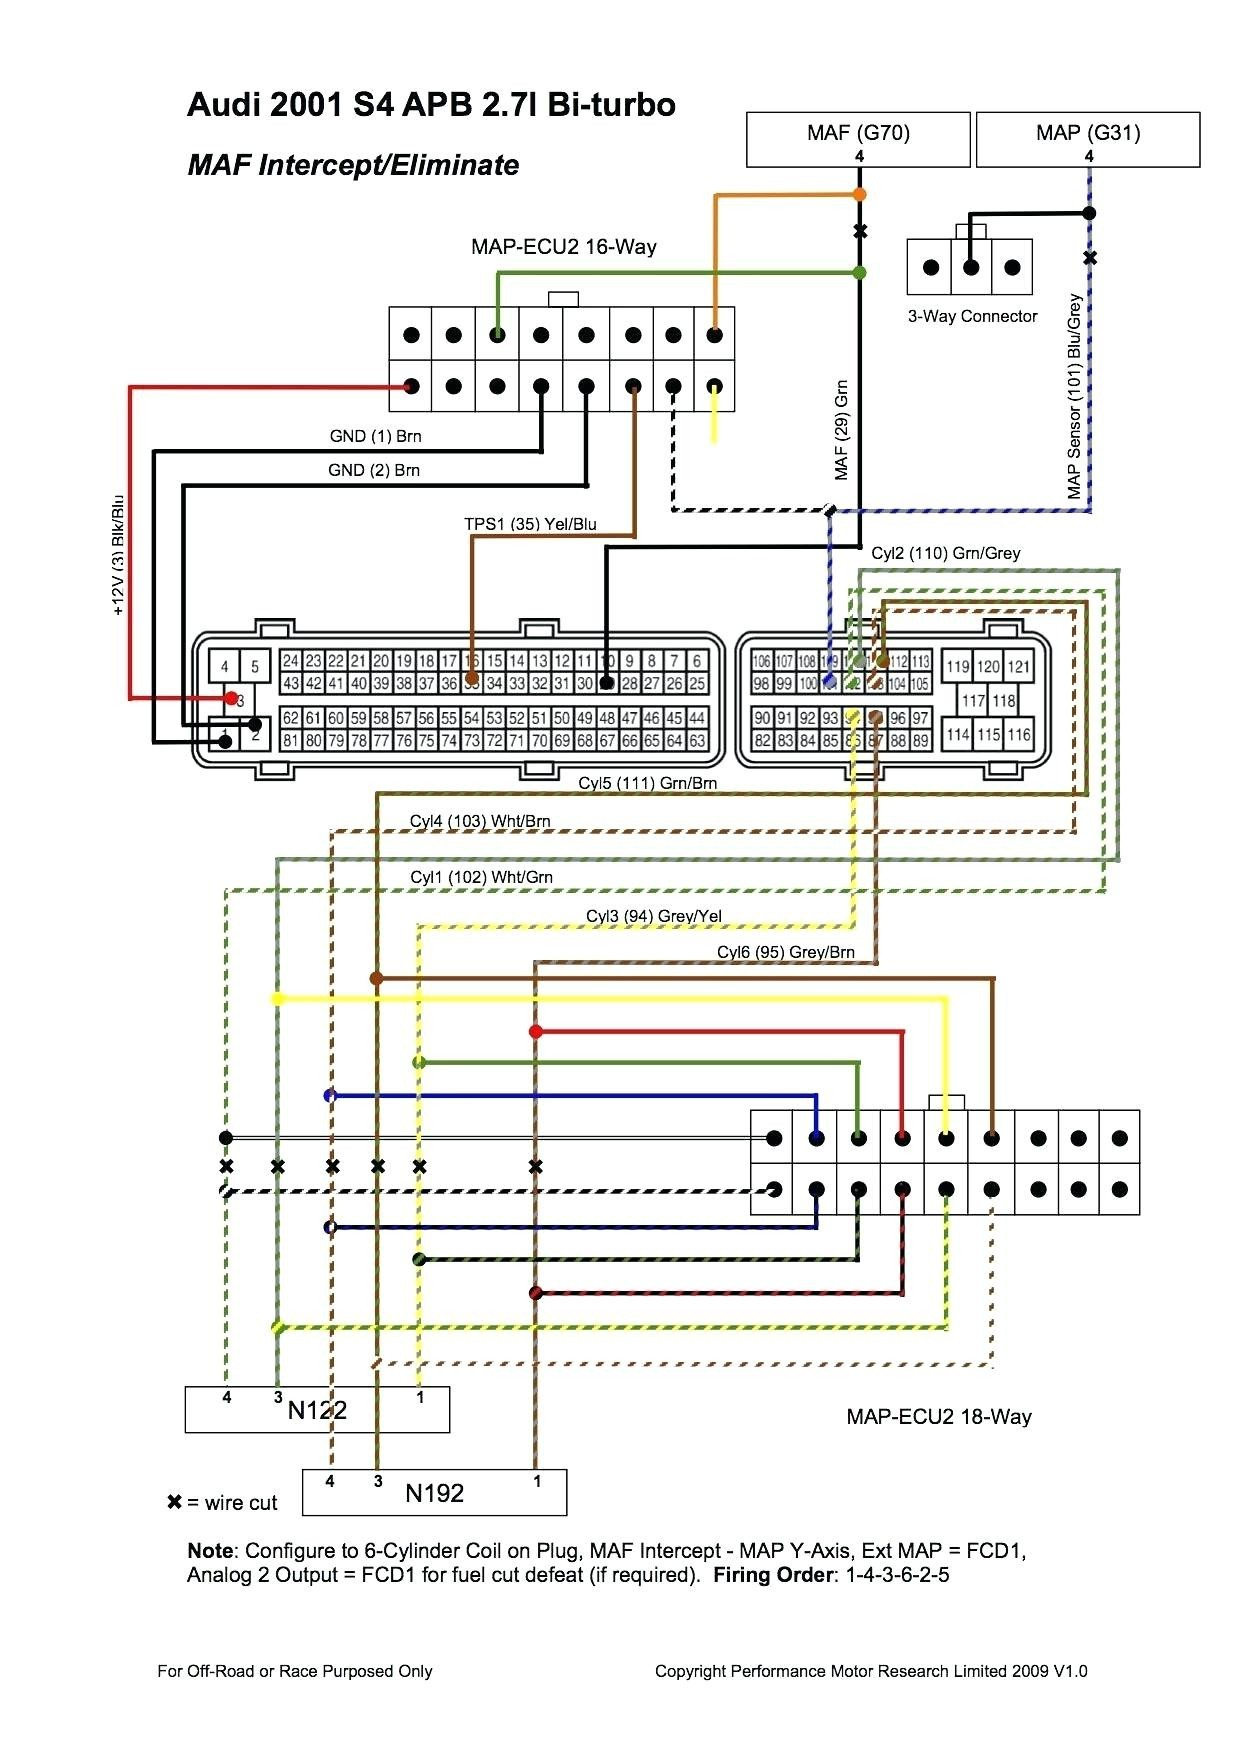 1997 Dodge Ram 1500 Radio Wiring Diagram Full Size 2002 Durango Infinity Sound System Stereo